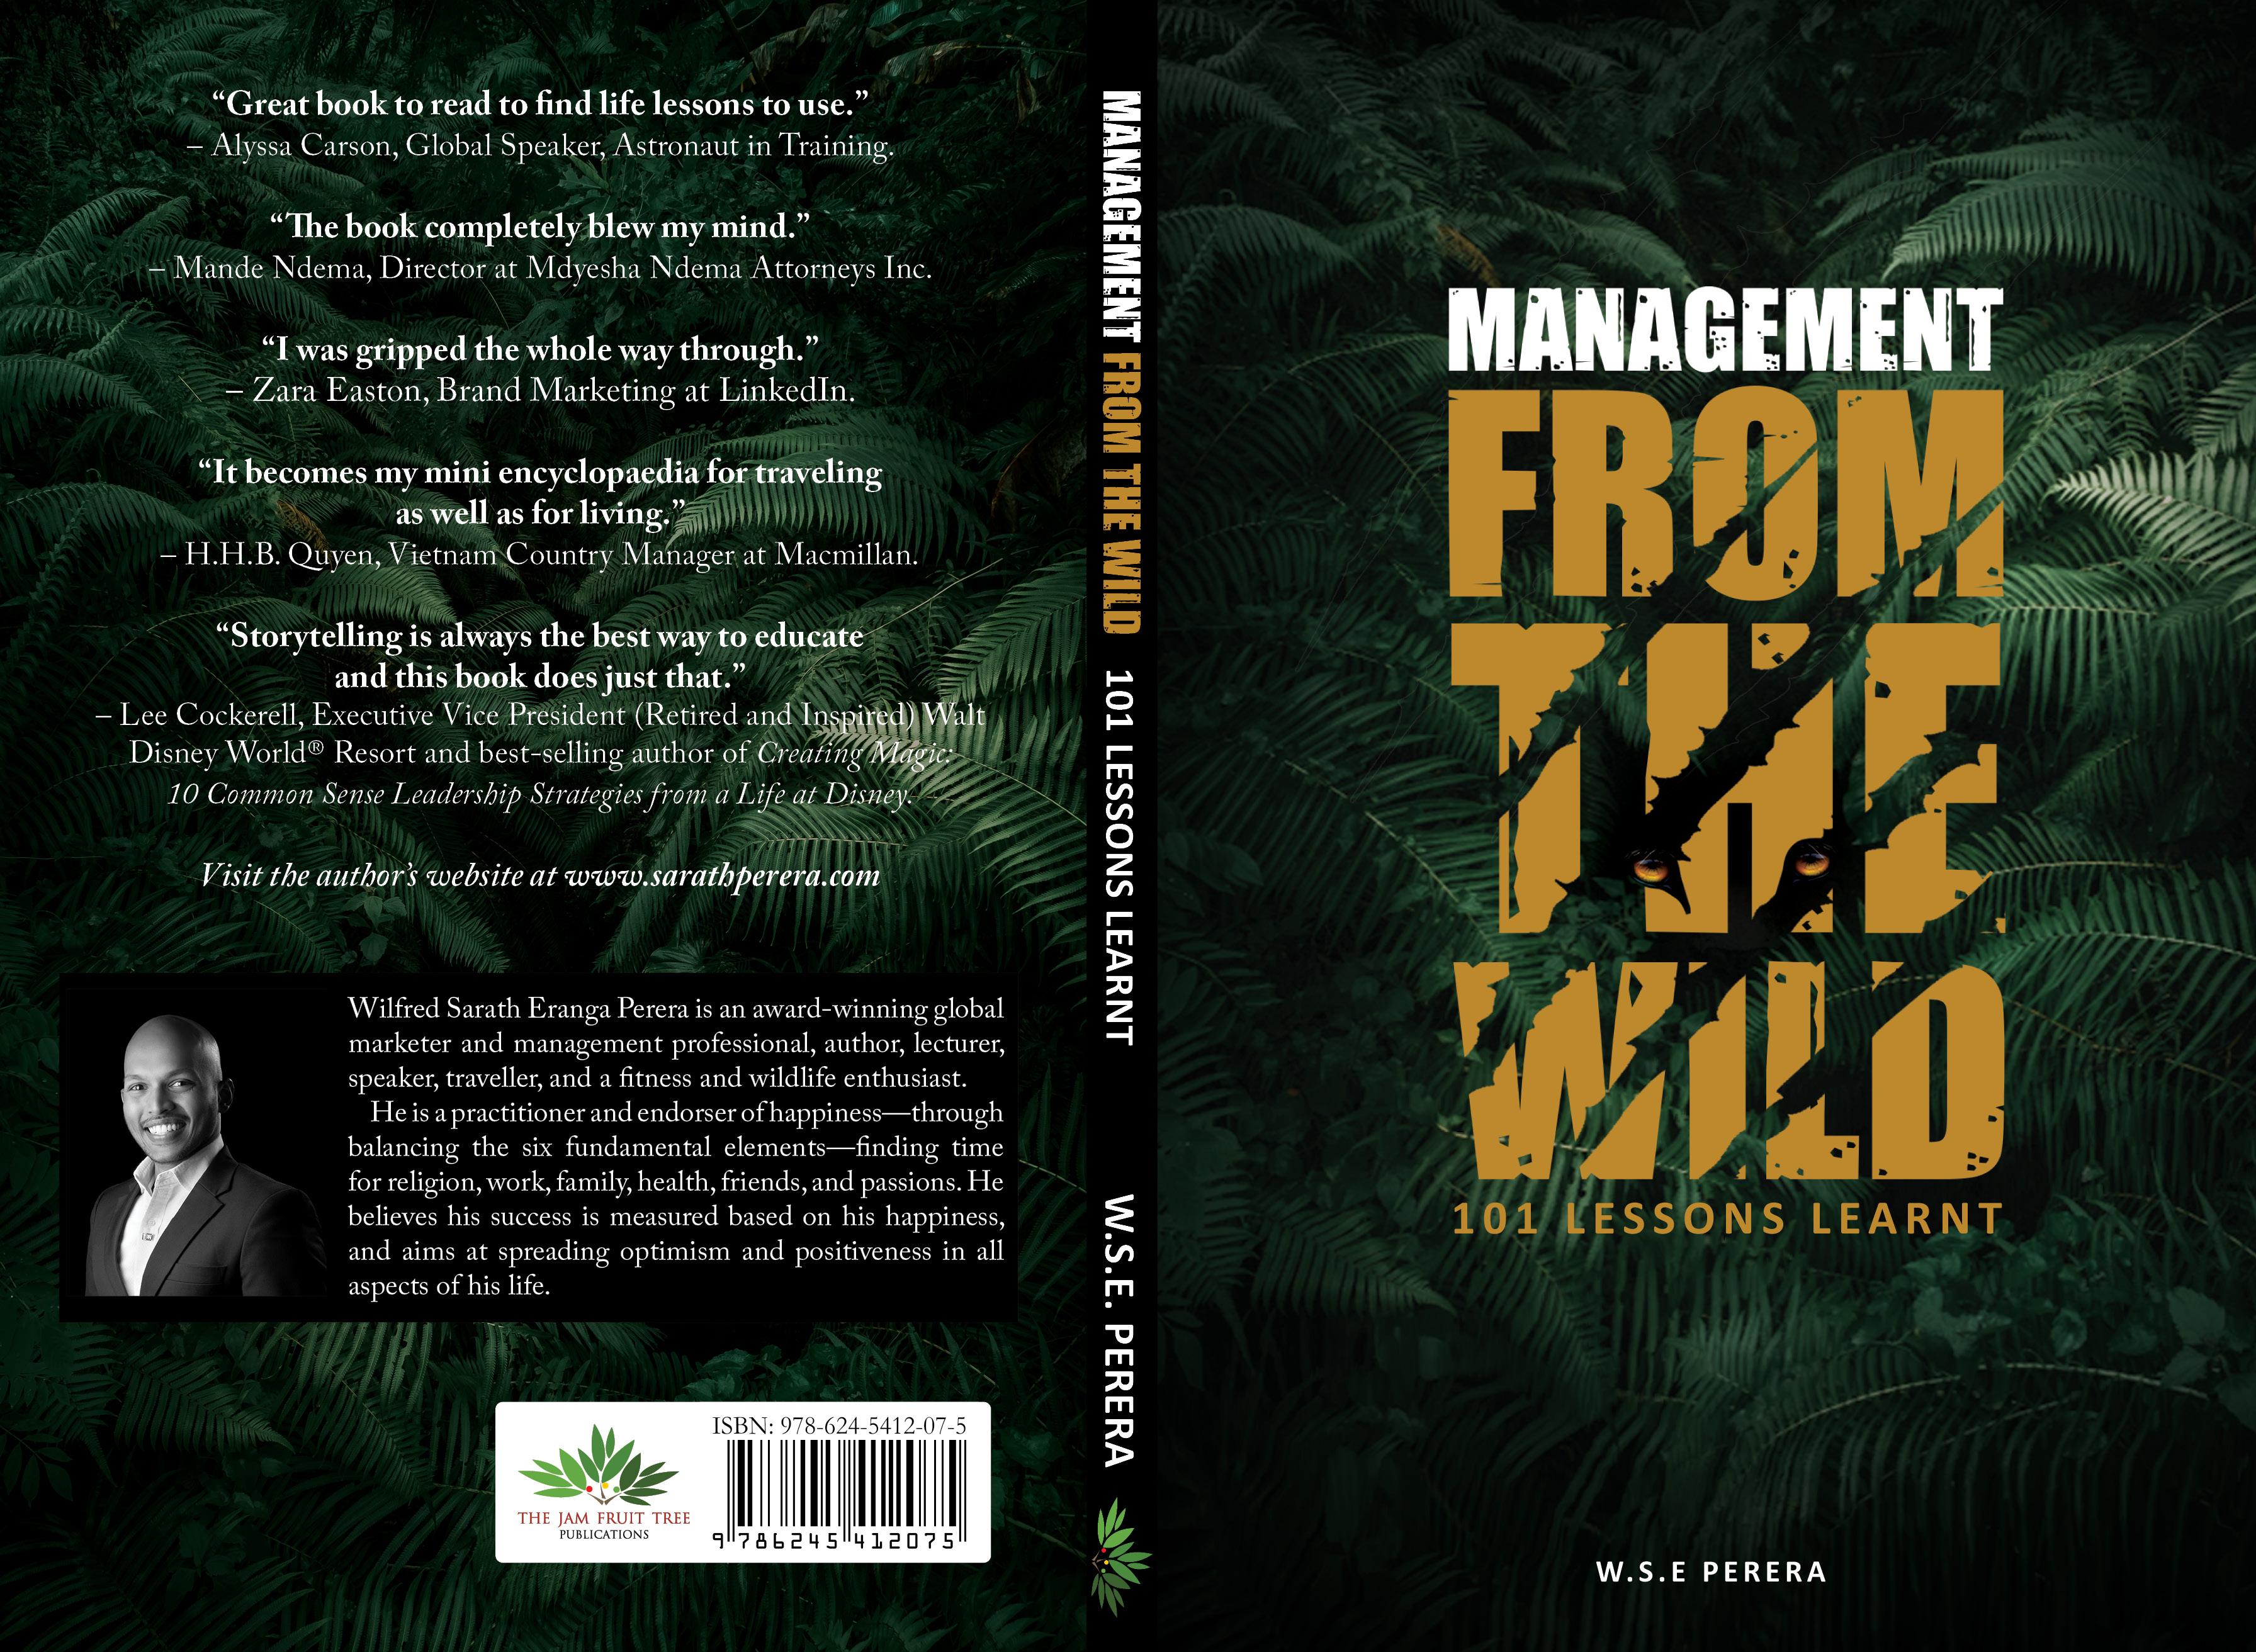 'World's first wildlife travel-based management lessons book' by Wilfred Sarath Eranga Perera.